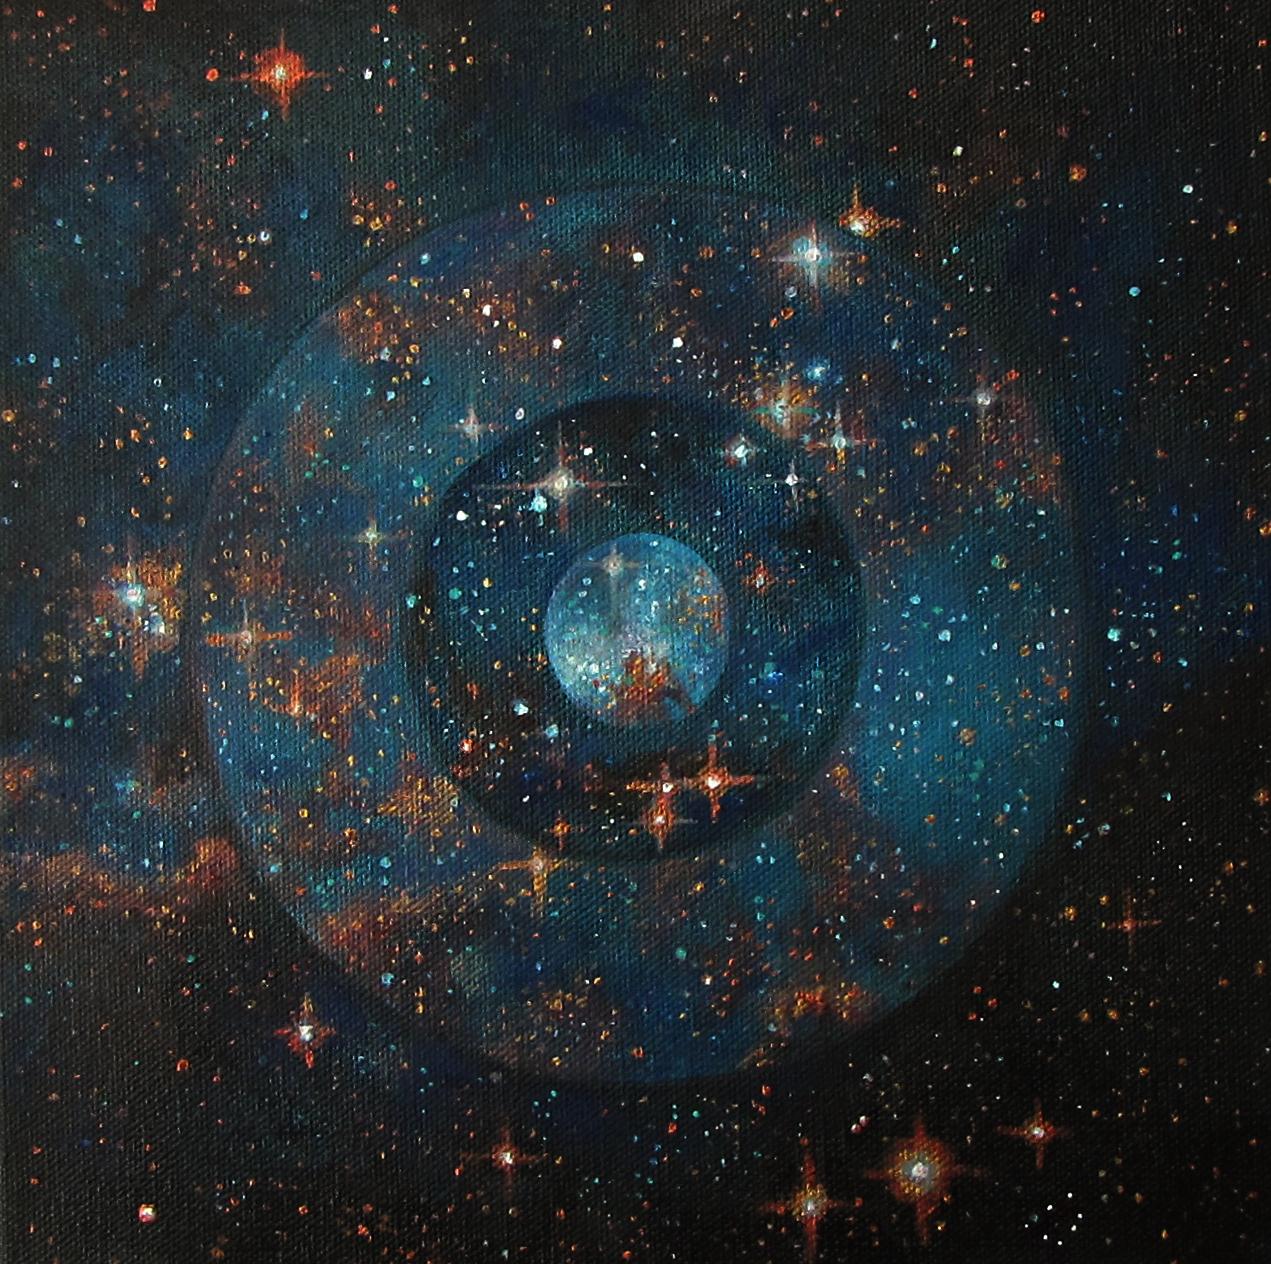 """9: Star Forming Region in the LMC"""